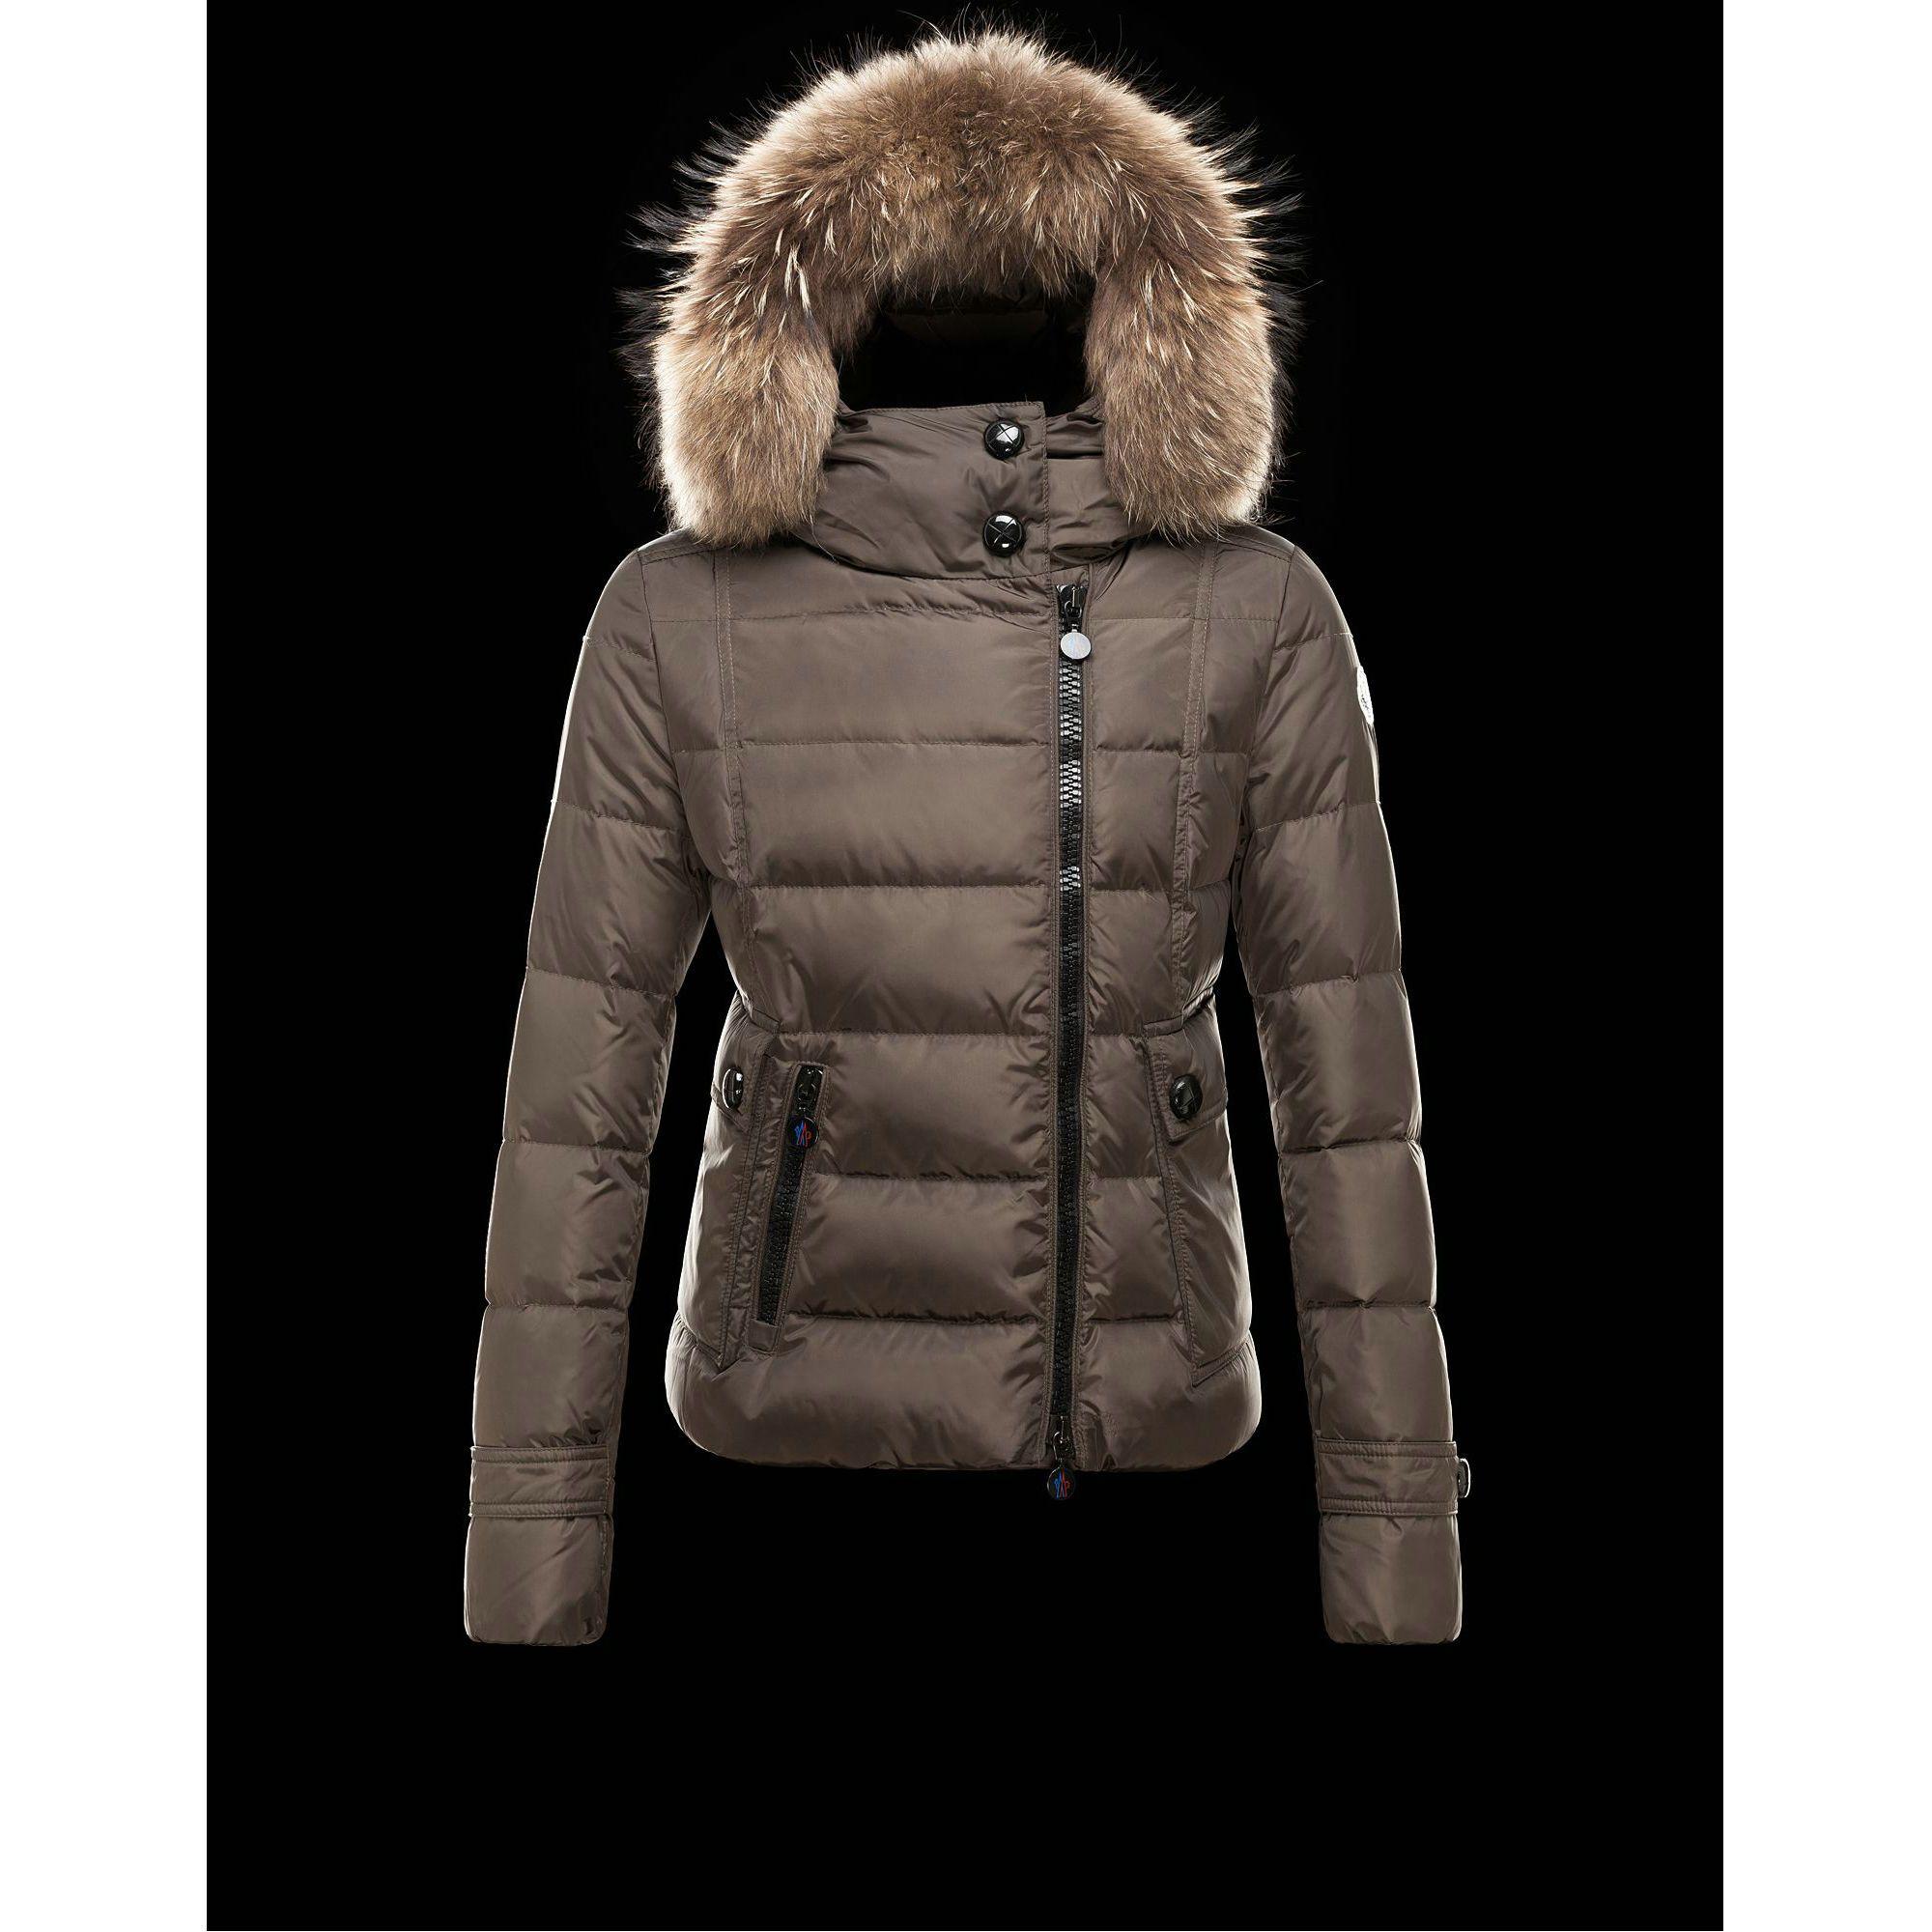 2015 New! Moncler Bryone Down Jacket For Women Dark Green